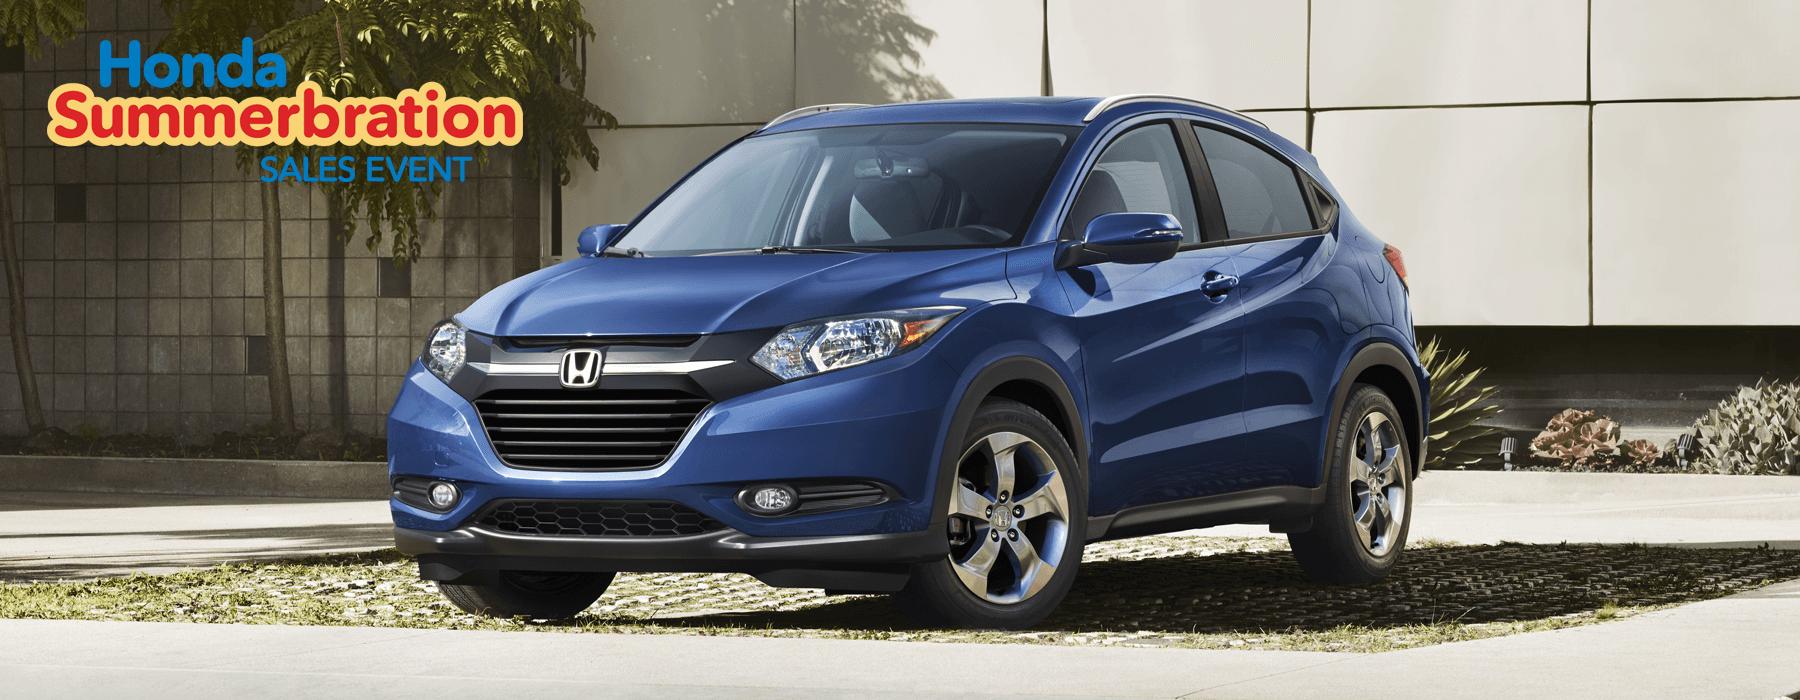 Honda Summerbration Sale 2017 HR-V